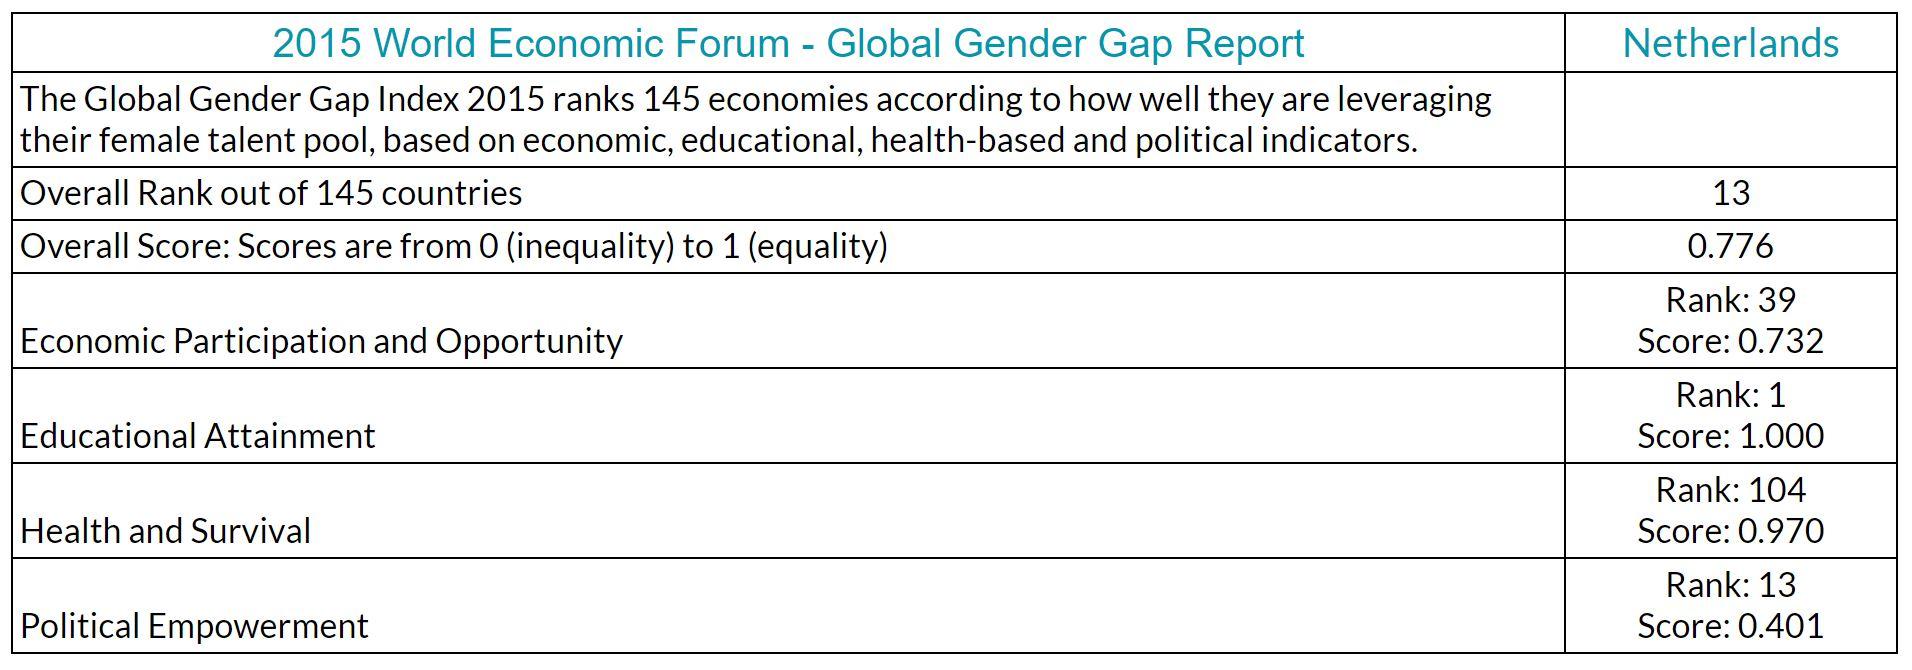 World Economic Forum Global Gender Gap Report - Netherlands